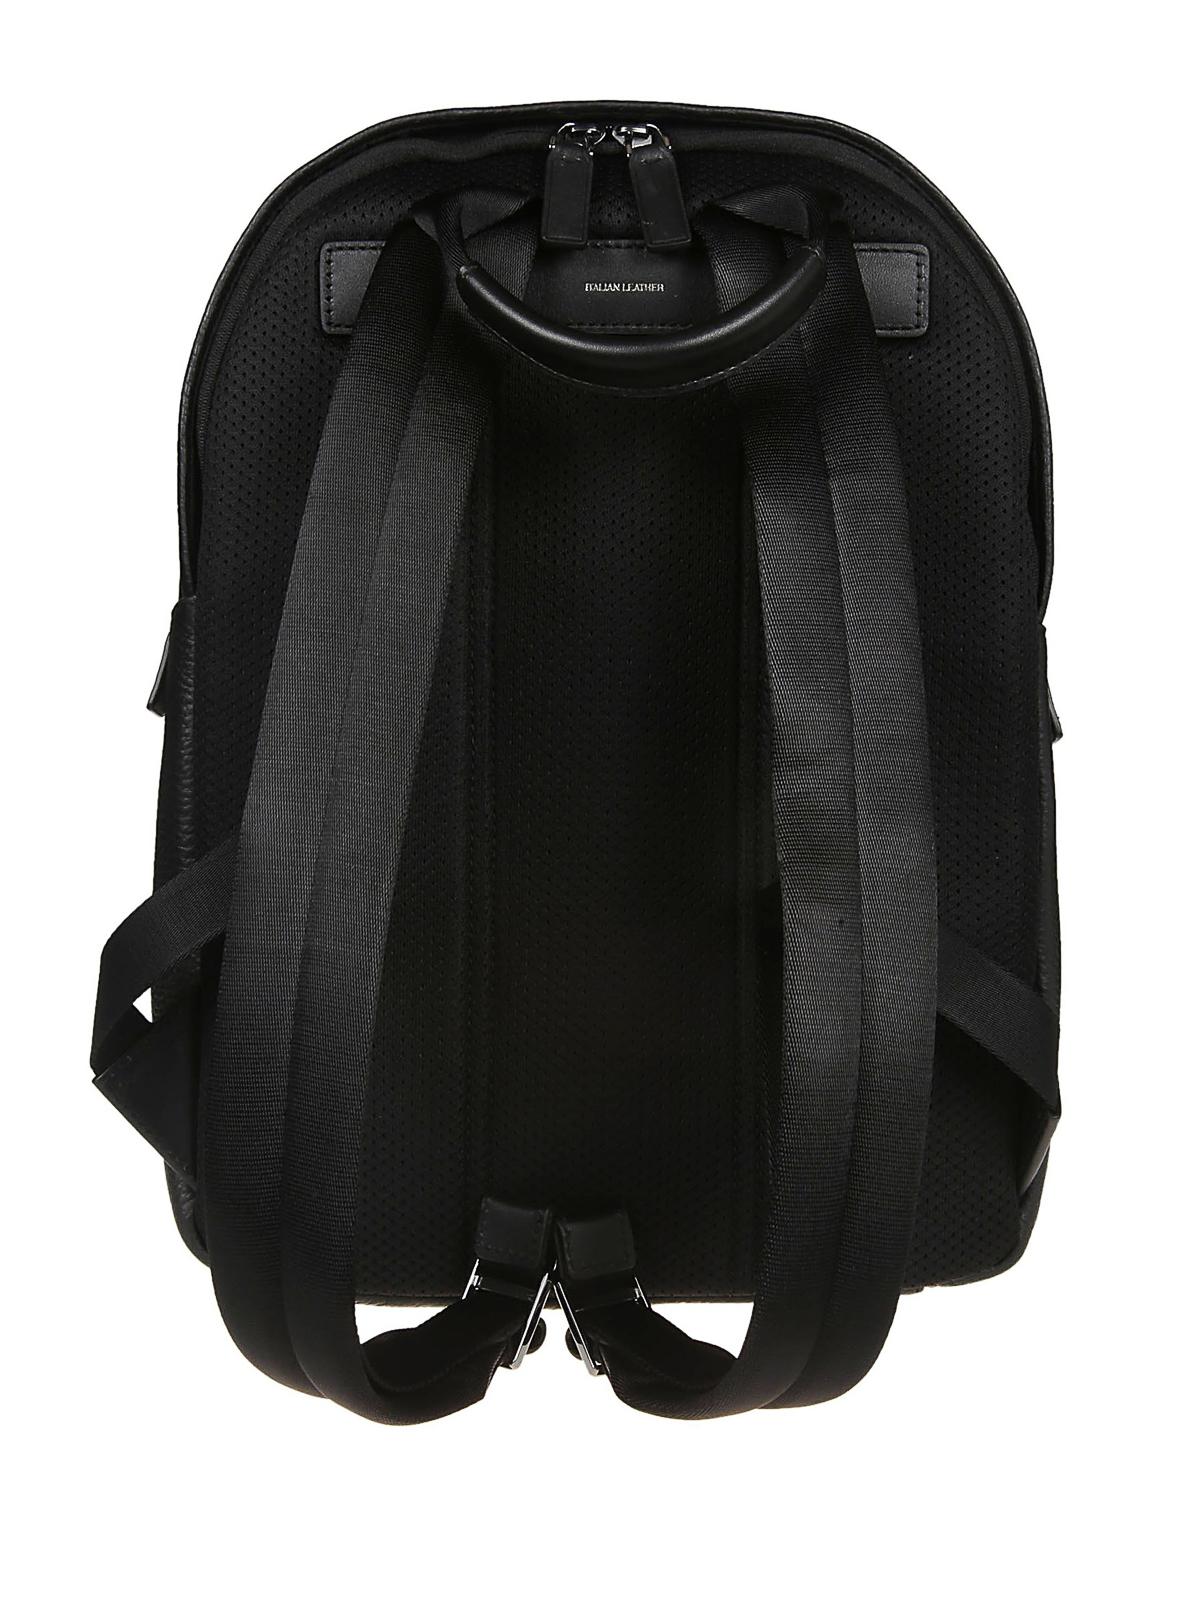 67b3f320455c9d iKRIX MICHAEL KORS: backpacks - Greyson black pebble leather backpack